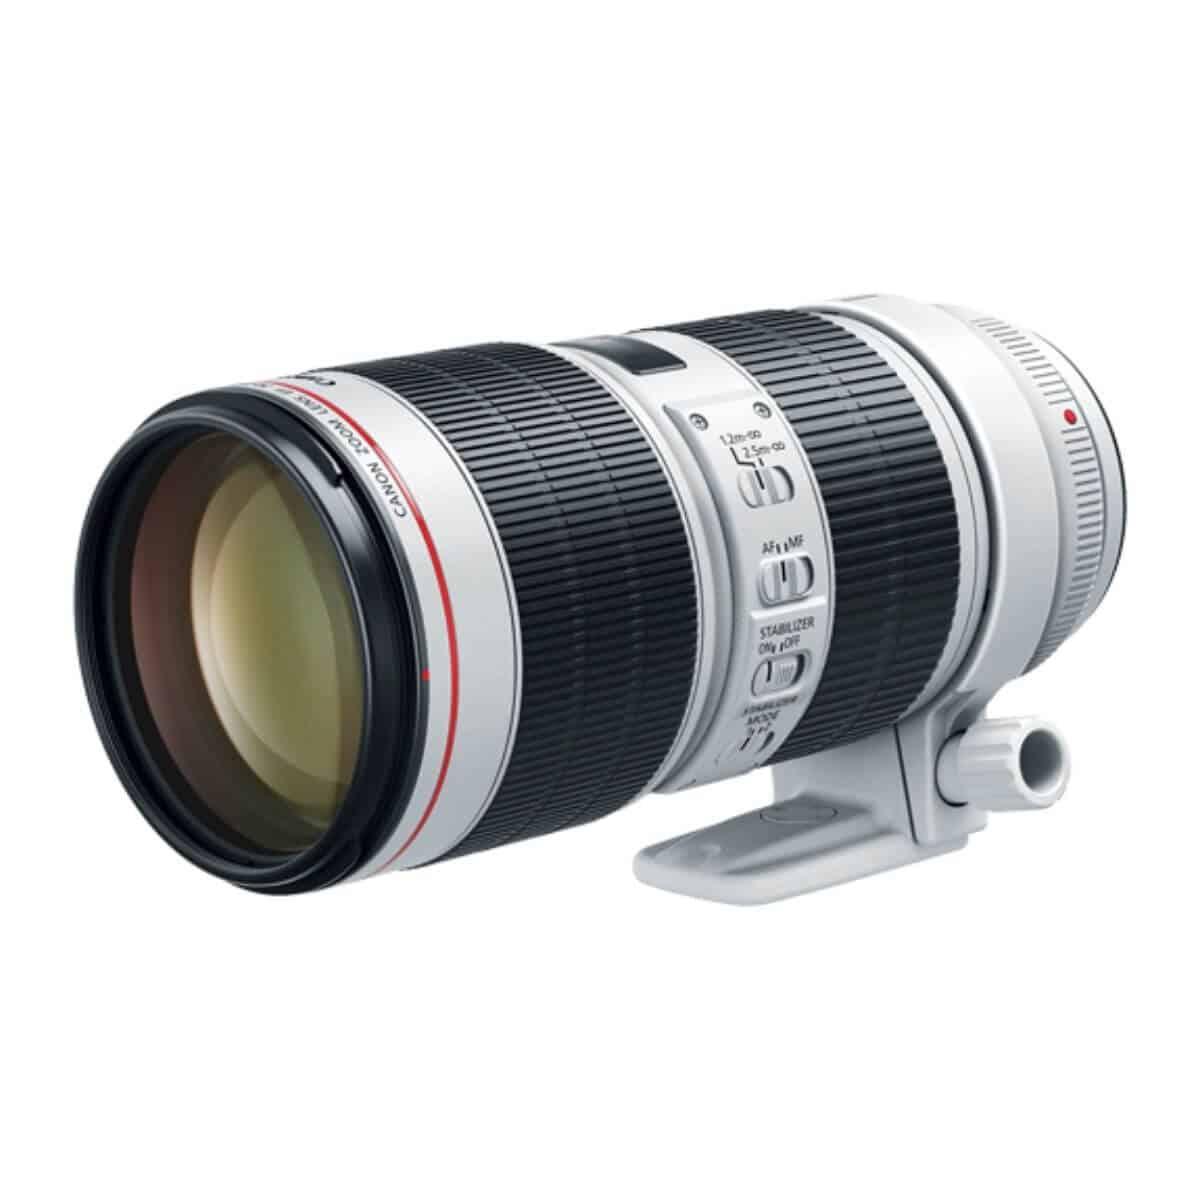 Canon 70-200mm f/2.8 lens.